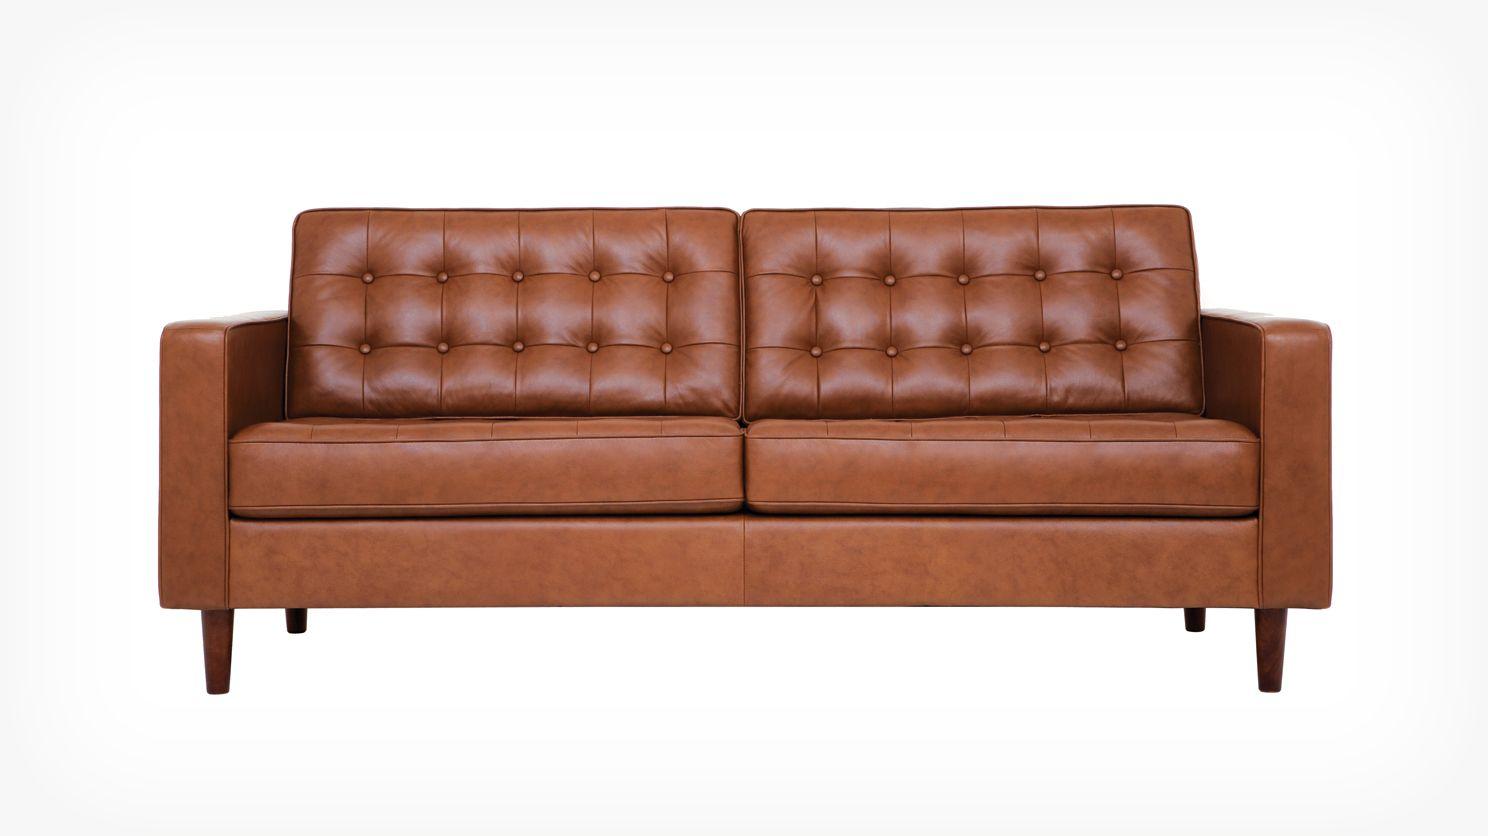 Reverie Apartment Sofa - Leather | Furniture in 2019 ...